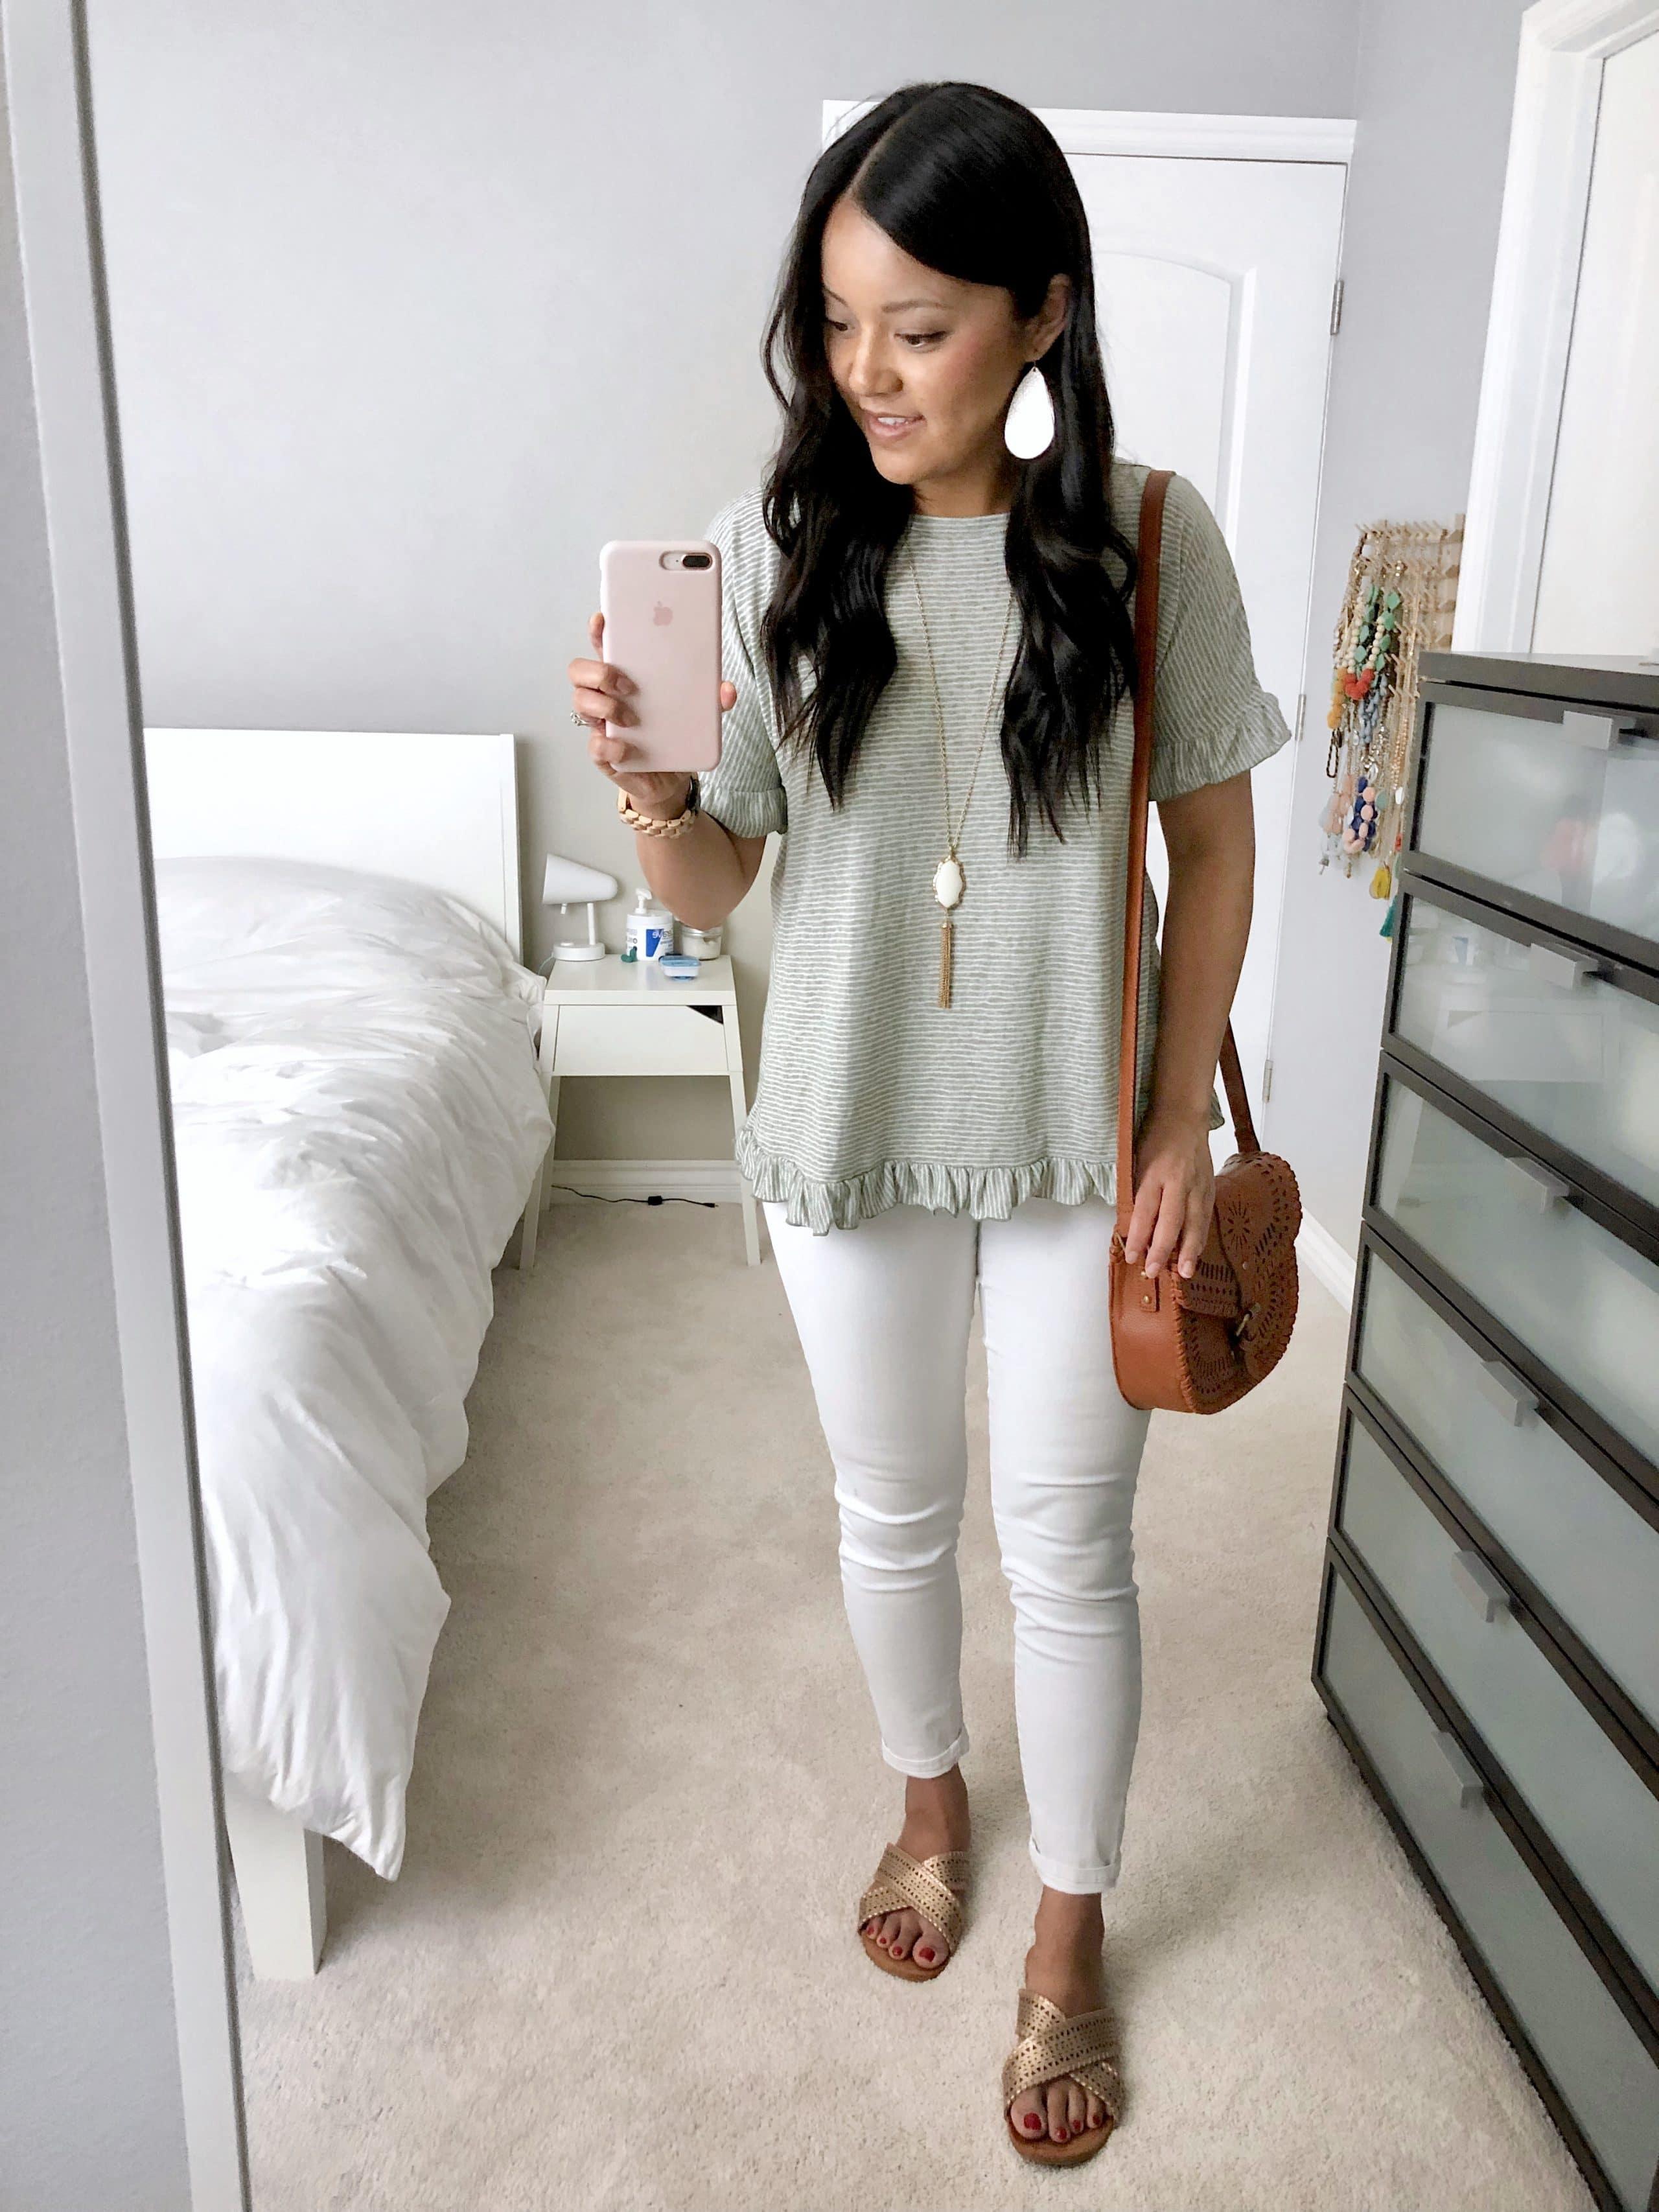 Striped Ruffle Top + White Jeans + White Accessories